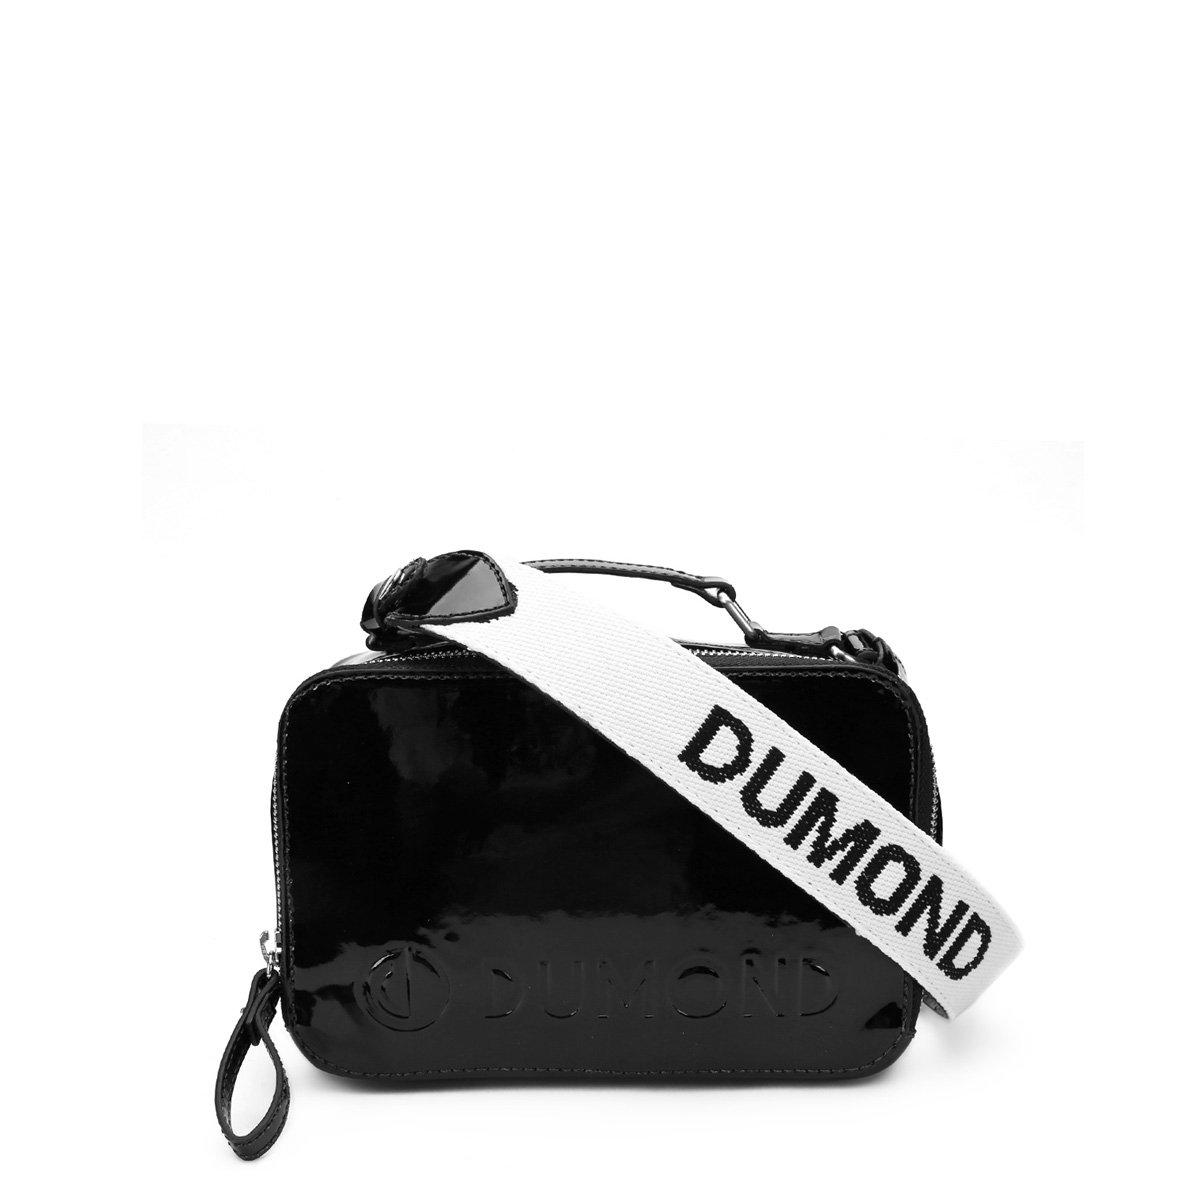 1ce7d58da7 Bolsa Dumond Mini Bag Box Alça Feminina - Compre Agora